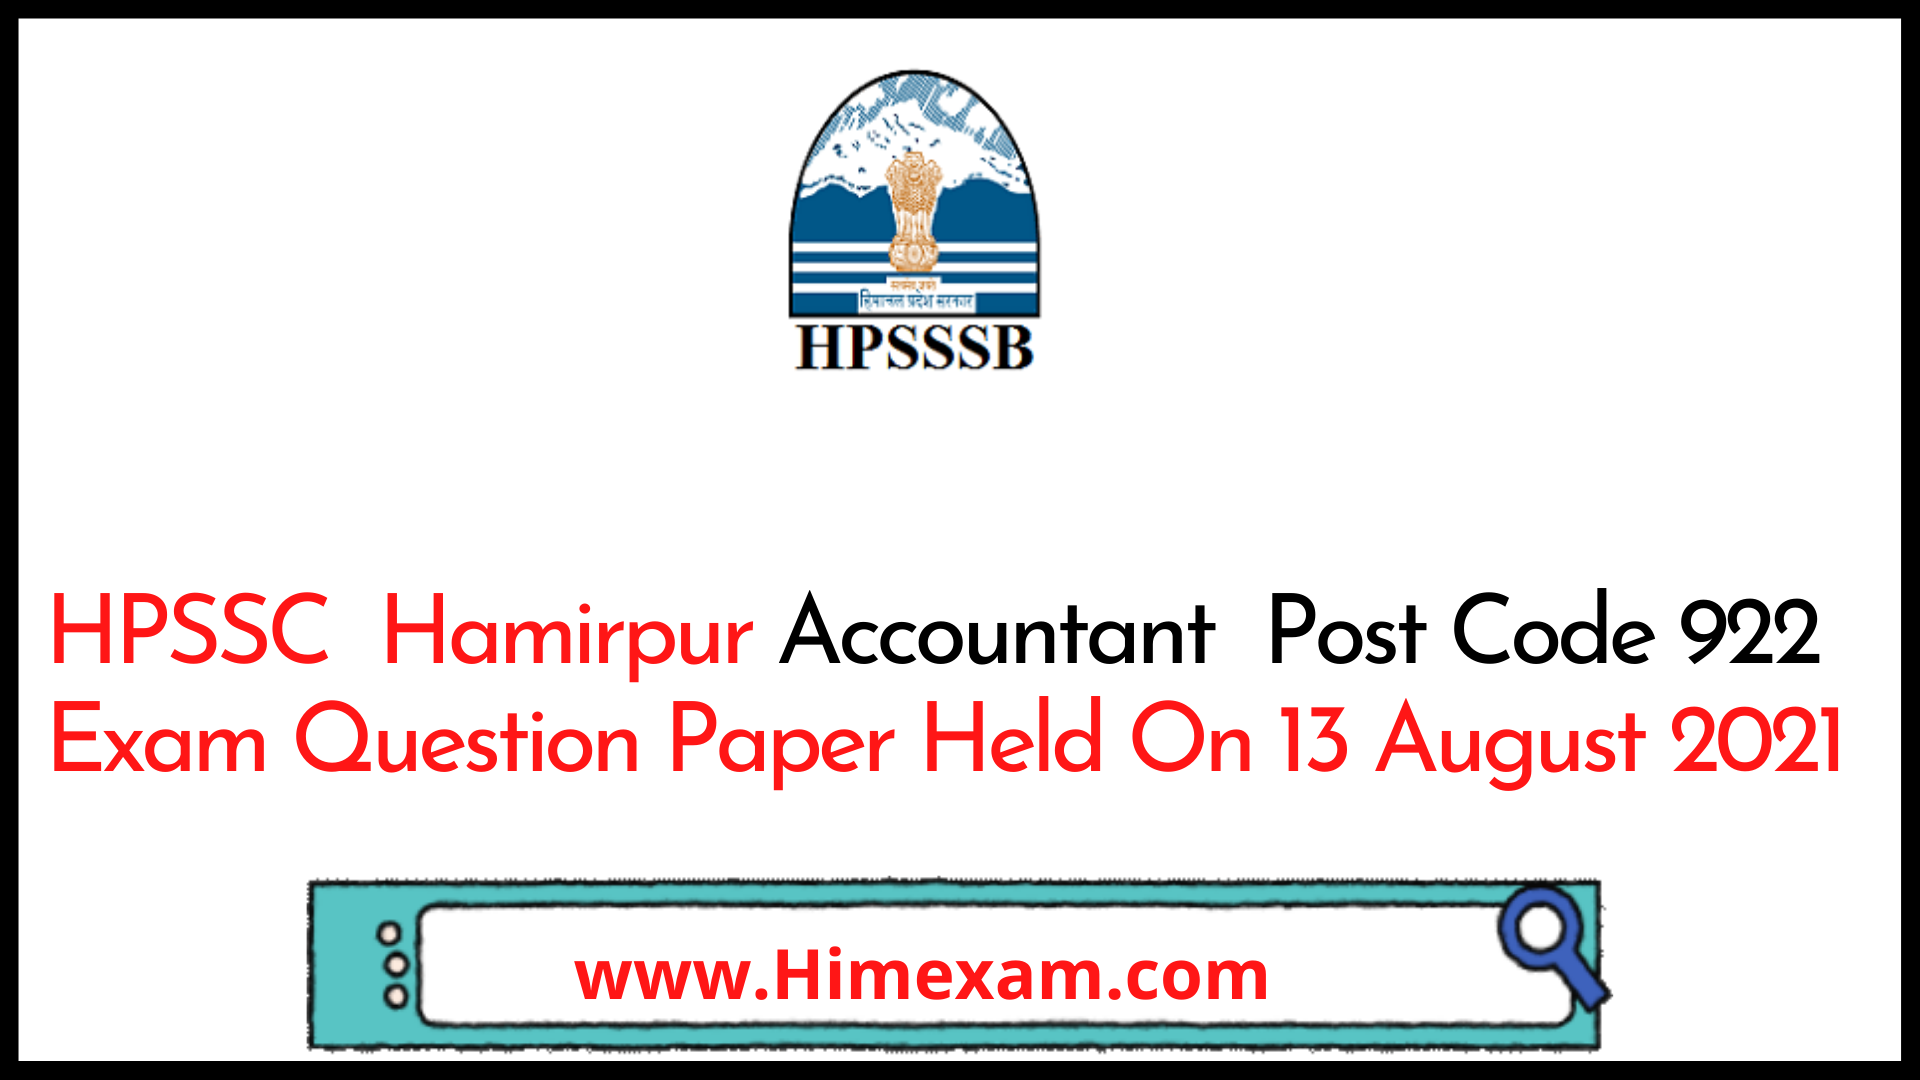 HPSSC  Hamirpur Accountant  Post Code 922 Exam Question Paper Held On 13 August 2021